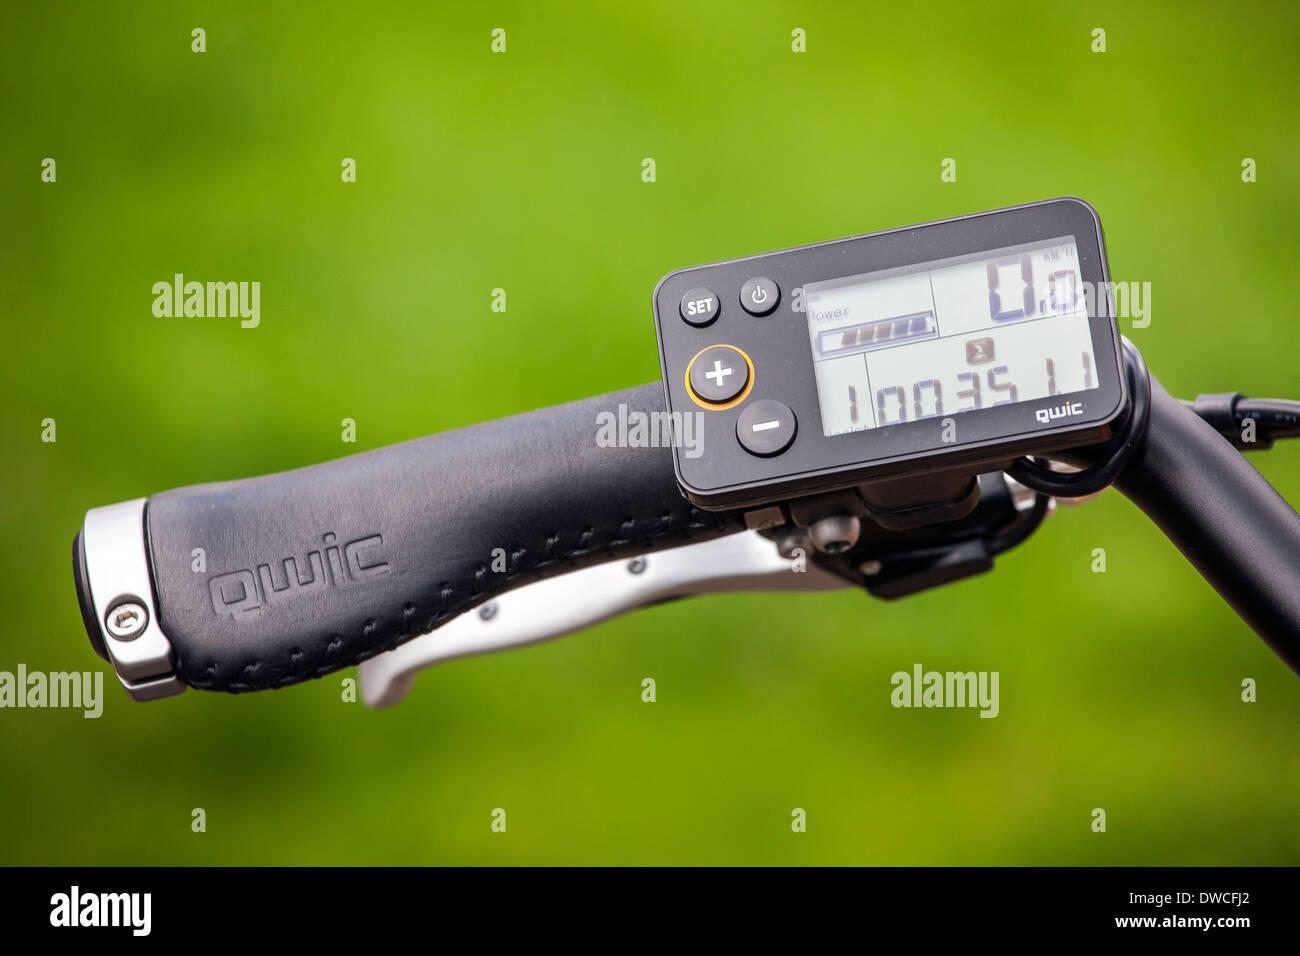 Digitale Anzeige der Pedelec / e-Bike / Elektrofahrrad zeigen Tacho mit integrierter Batterie Füllstandmessung Stockbild